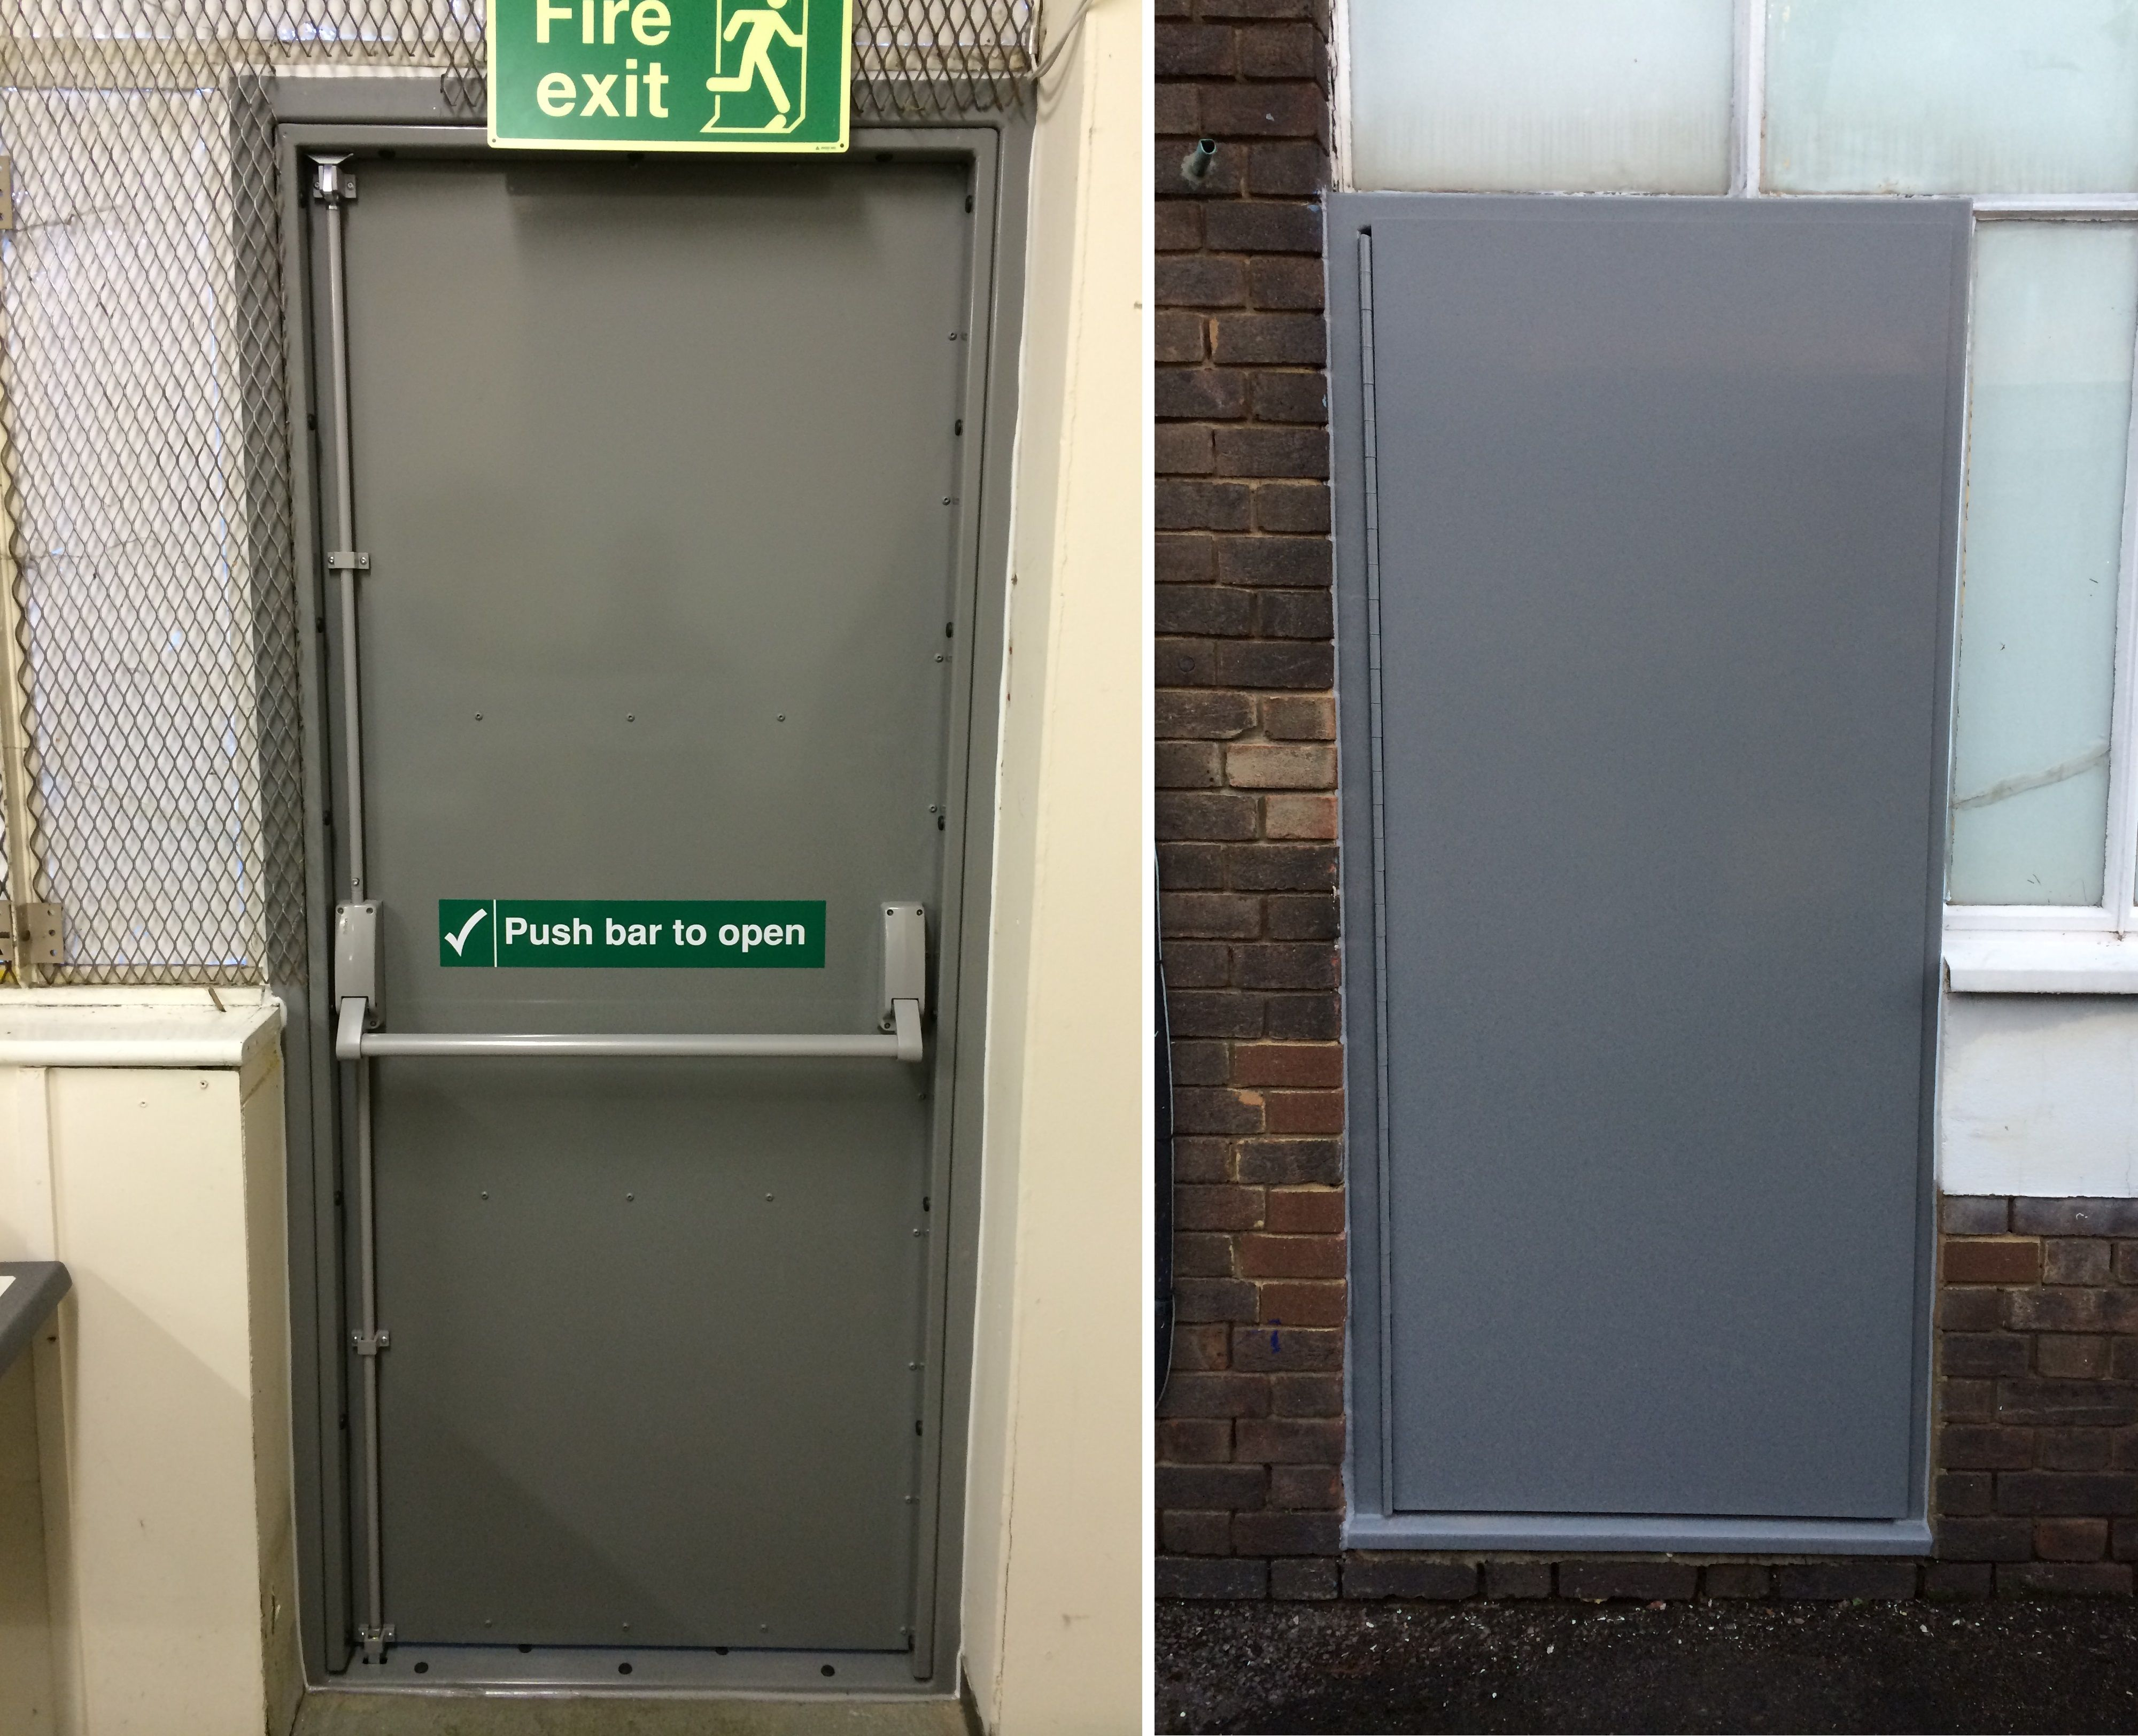 Fire Escape Door : Rsg single fire exit security doors heavy duty